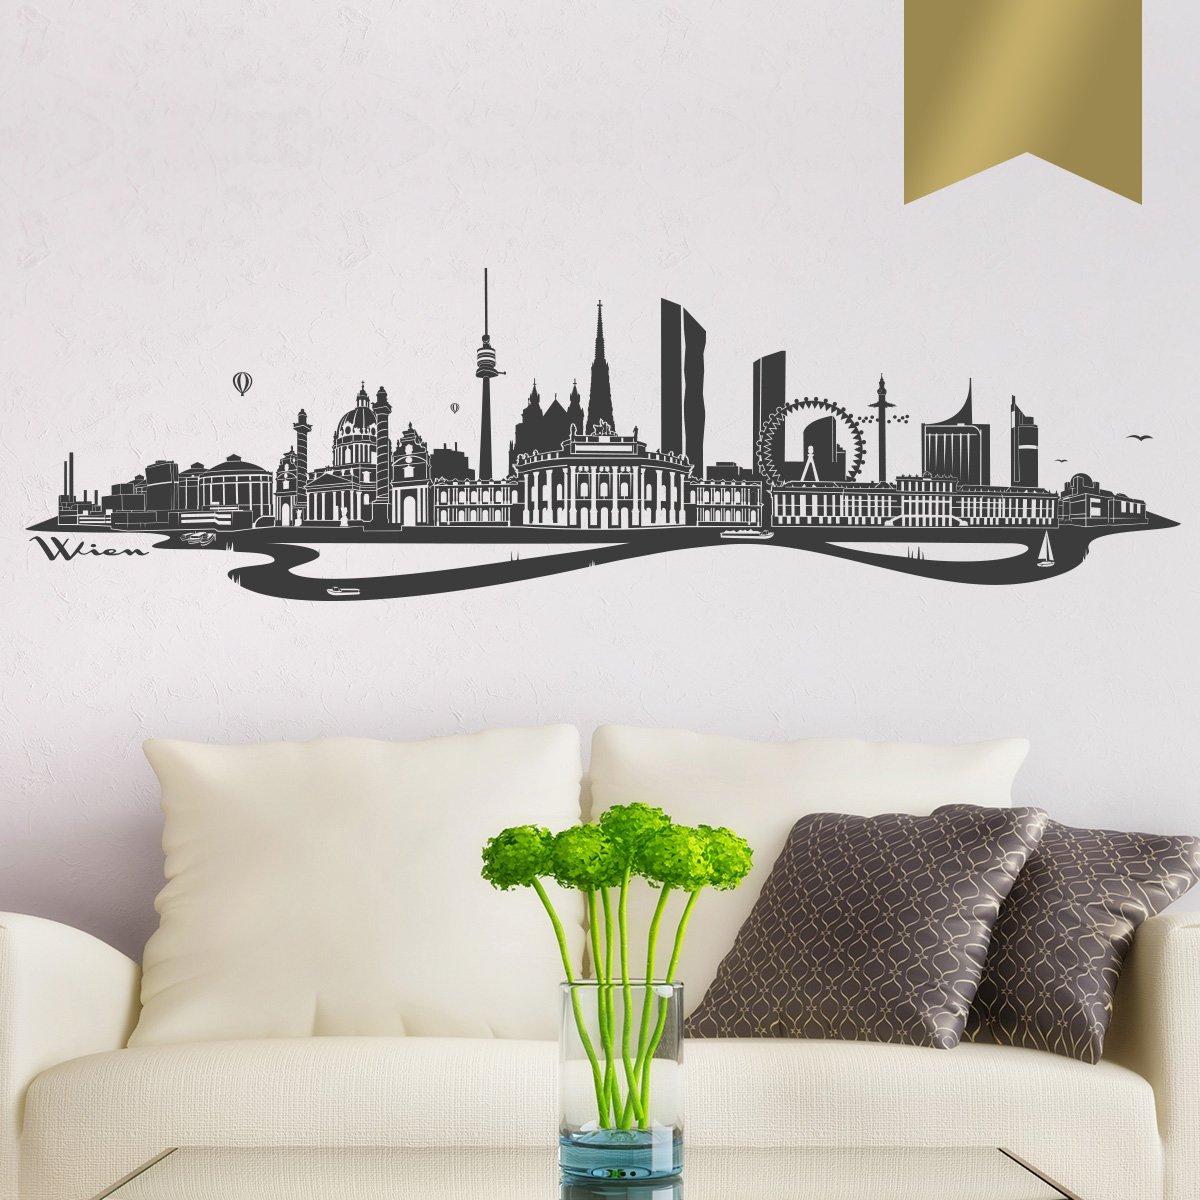 WANDKINGS Wandtattoo - - - Skyline Wien (mit Fluss) - 300 x 86 cm - Mittelgrau - Wähle aus 6 Größen & 35 Farben B078SGXKHW Wandtattoos & Wandbilder 0e9935